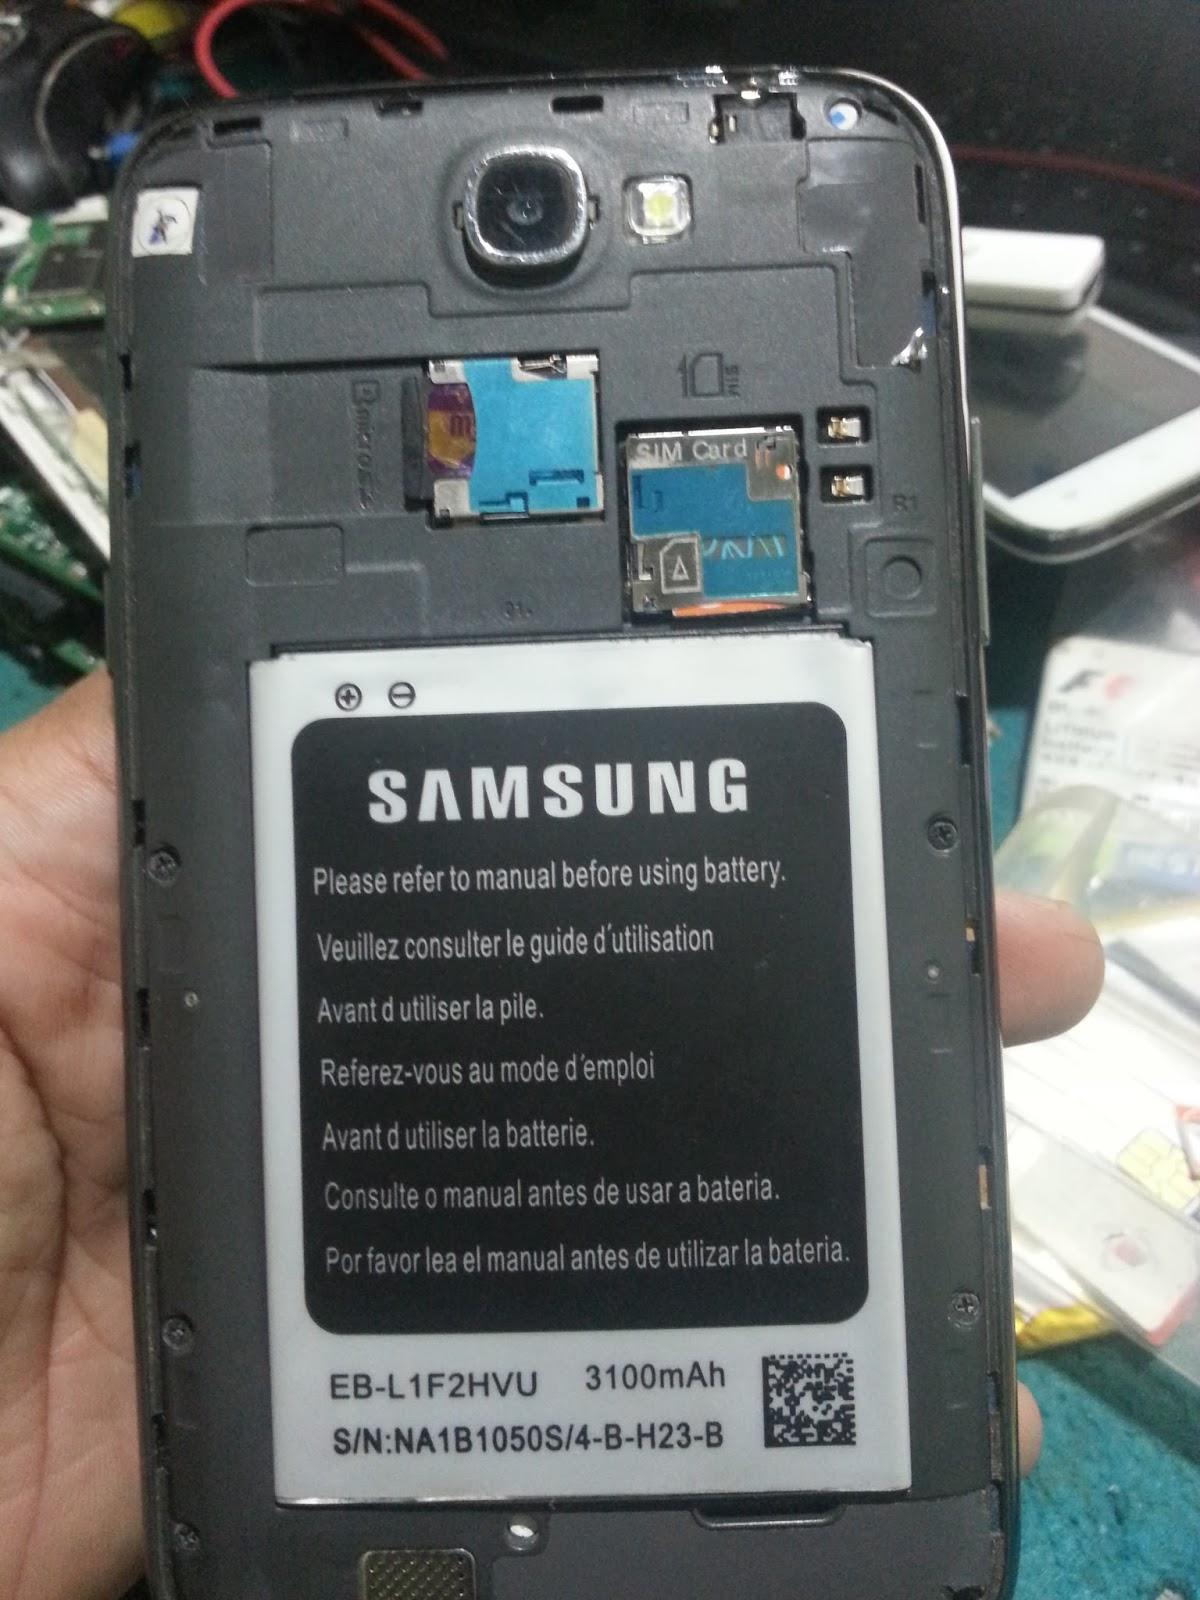 Samsung galaxy note gt N7100 firmware